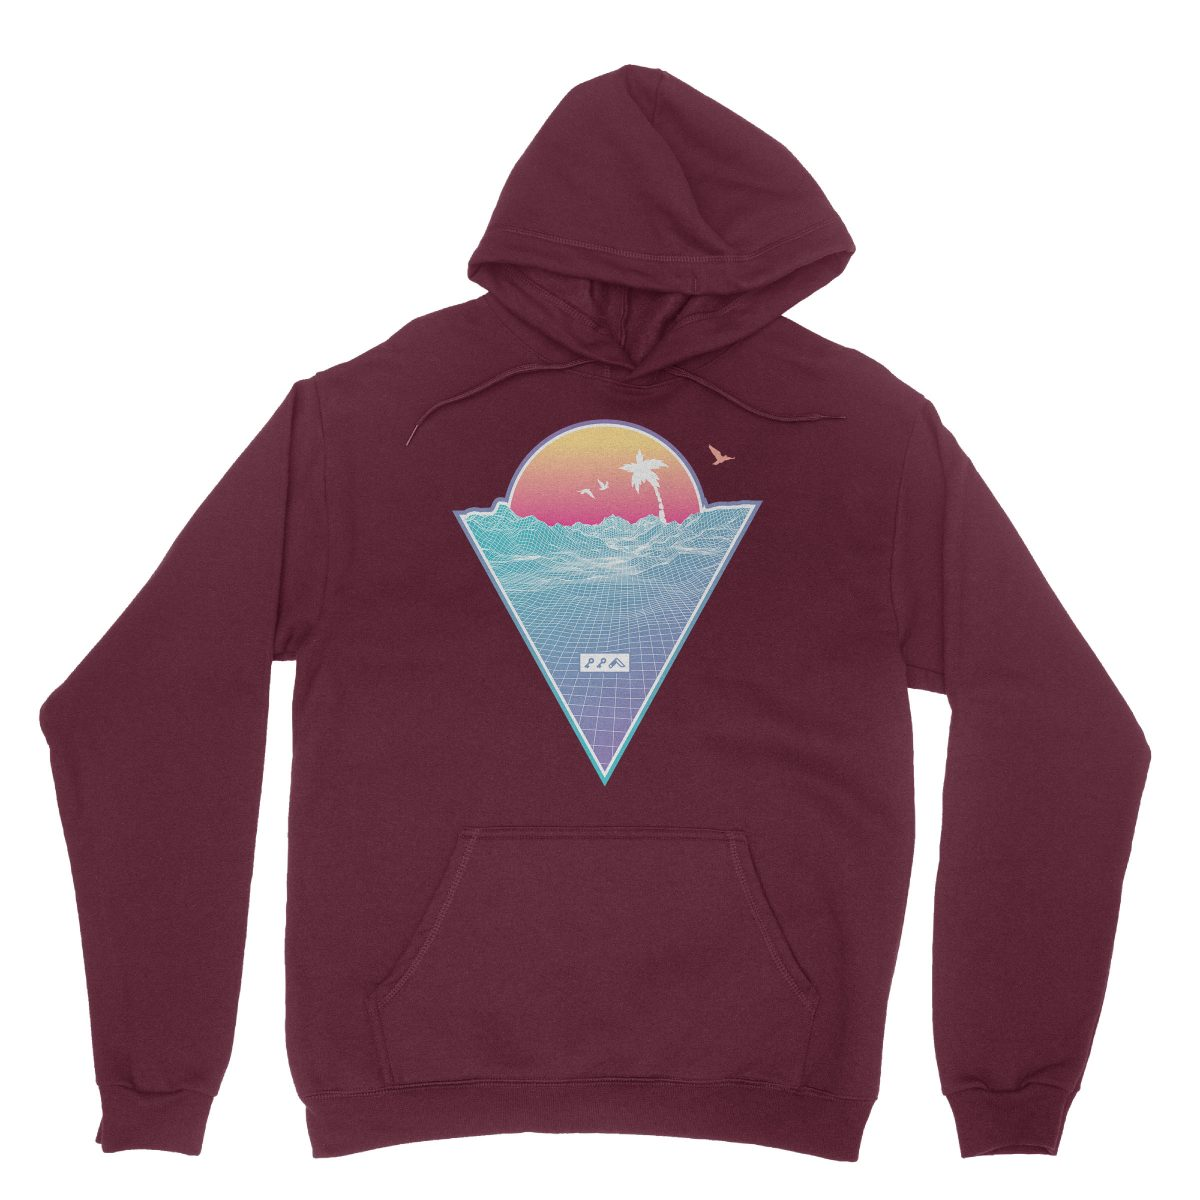 """OFF THE GRID"" cali vibes retro 80s design hoodie sweatshirts maroon by kikicutt"